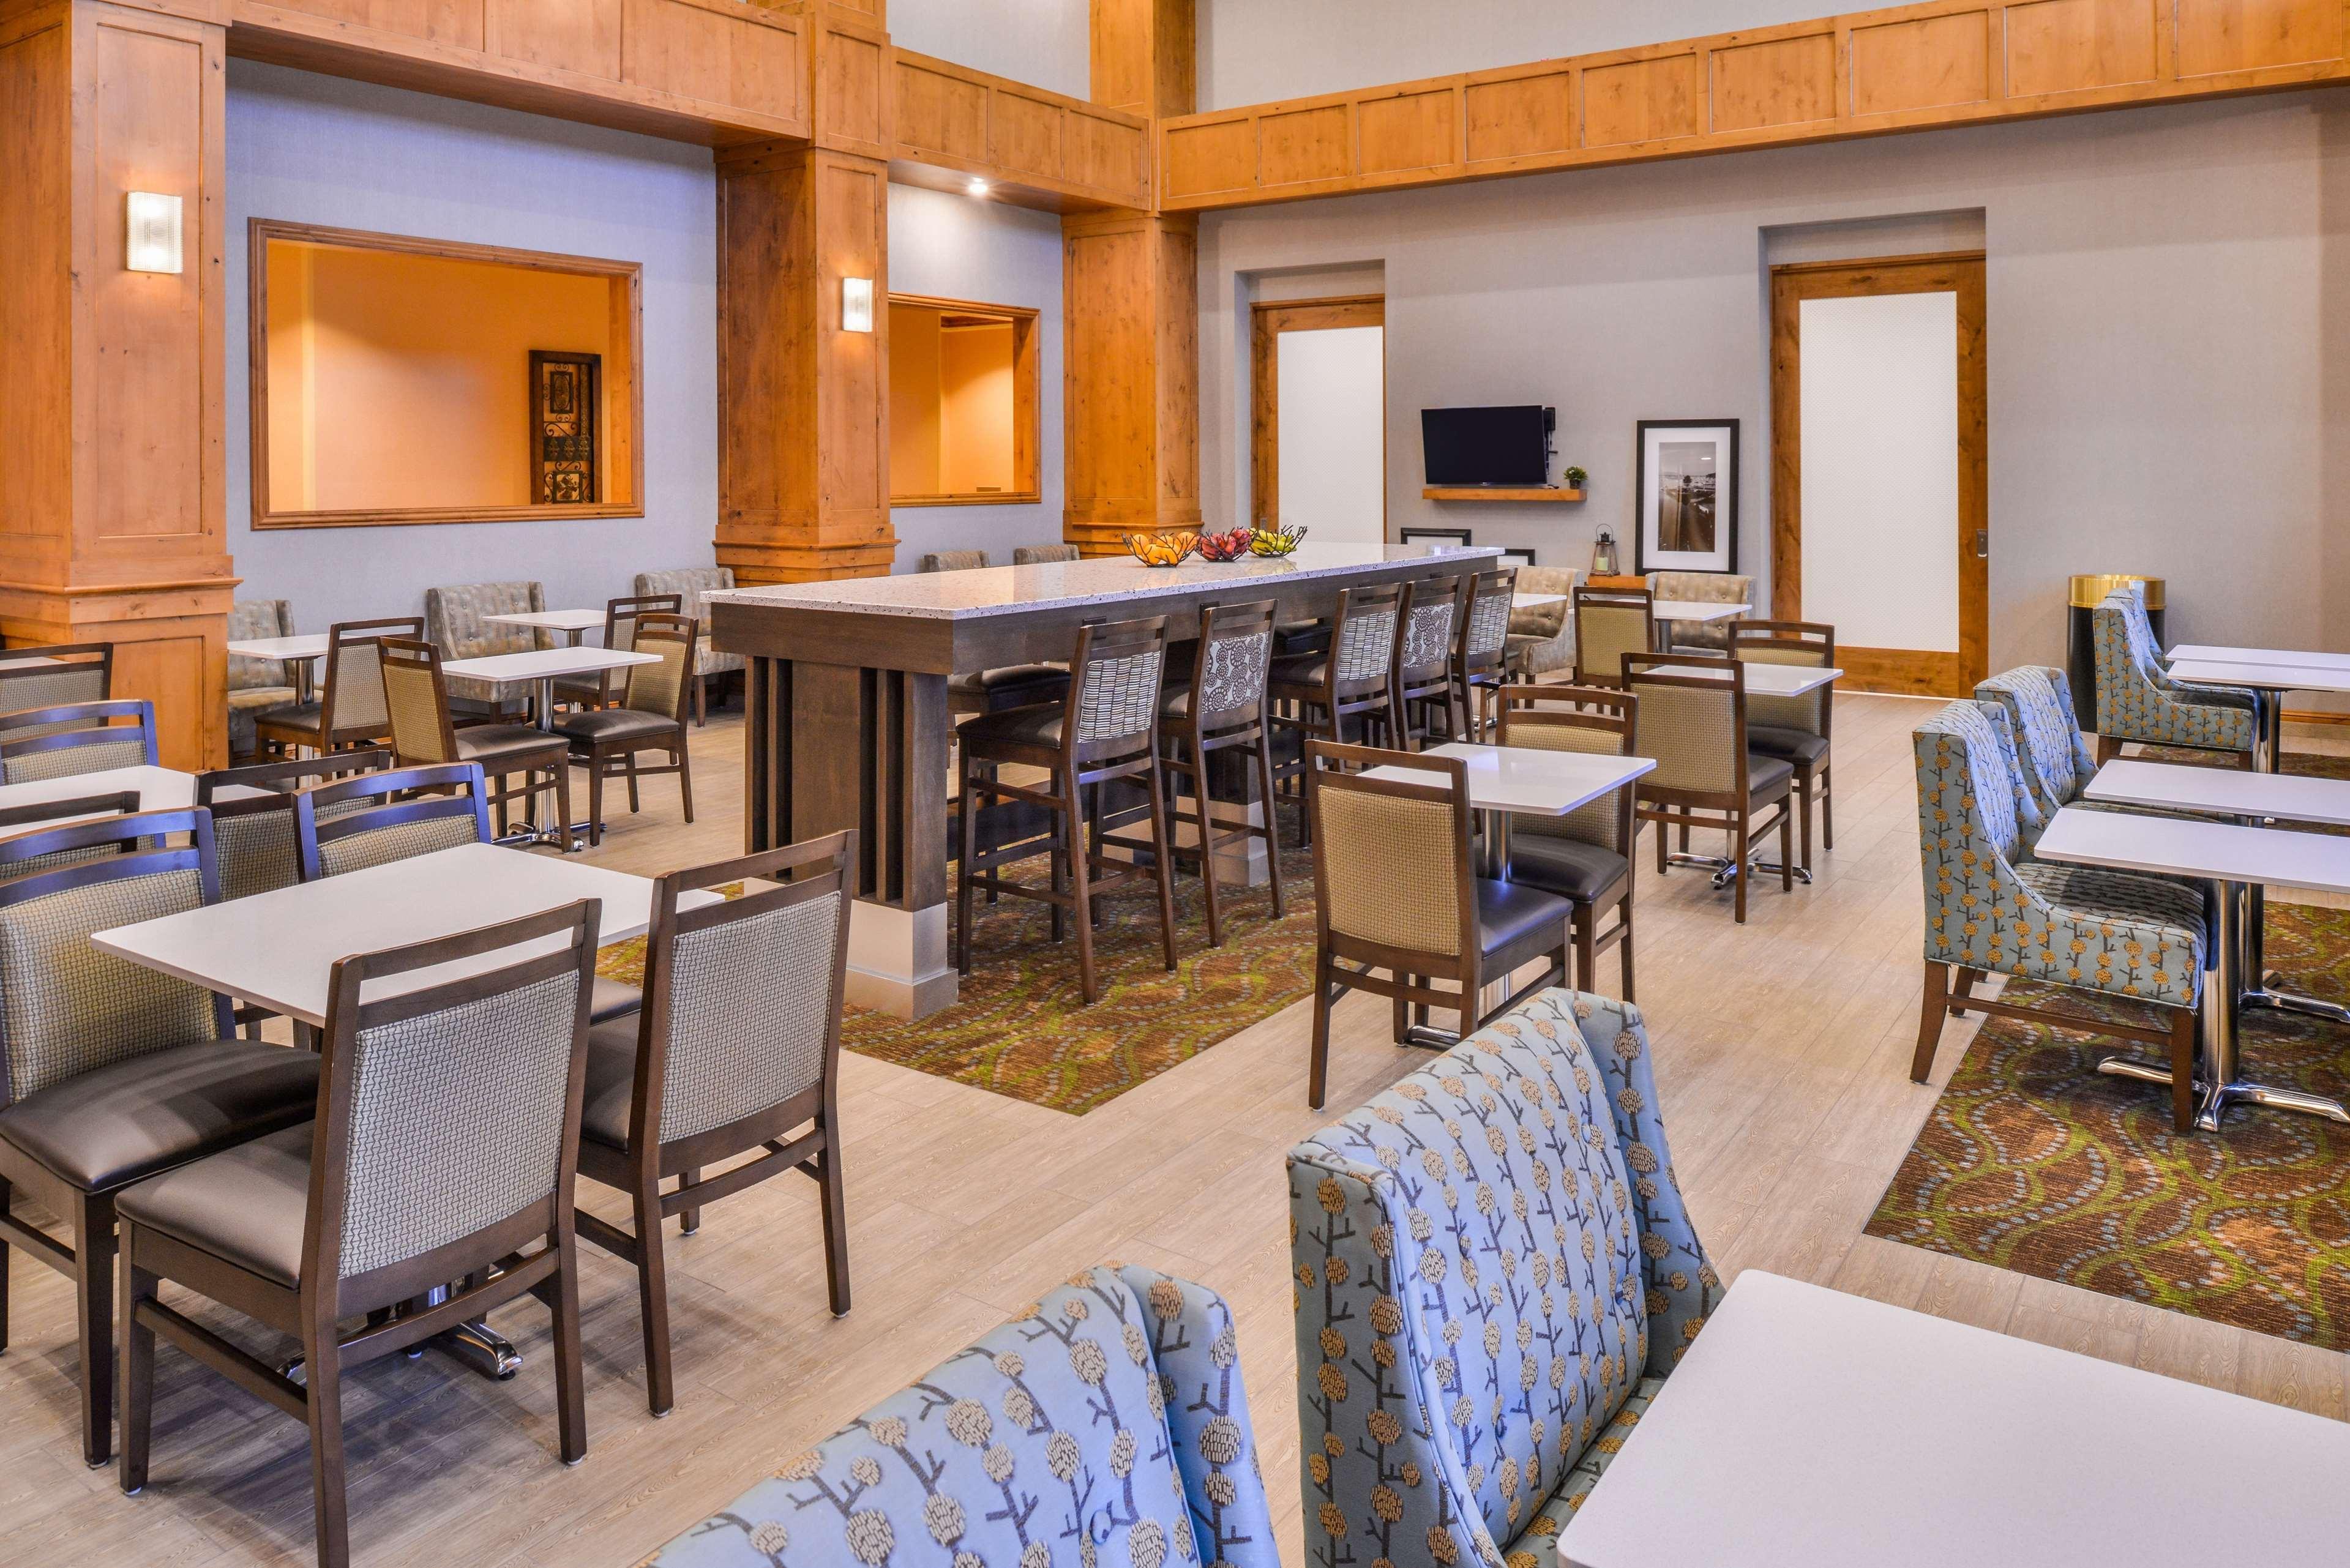 Hampton Inn & Suites Coeur d' Alene image 13